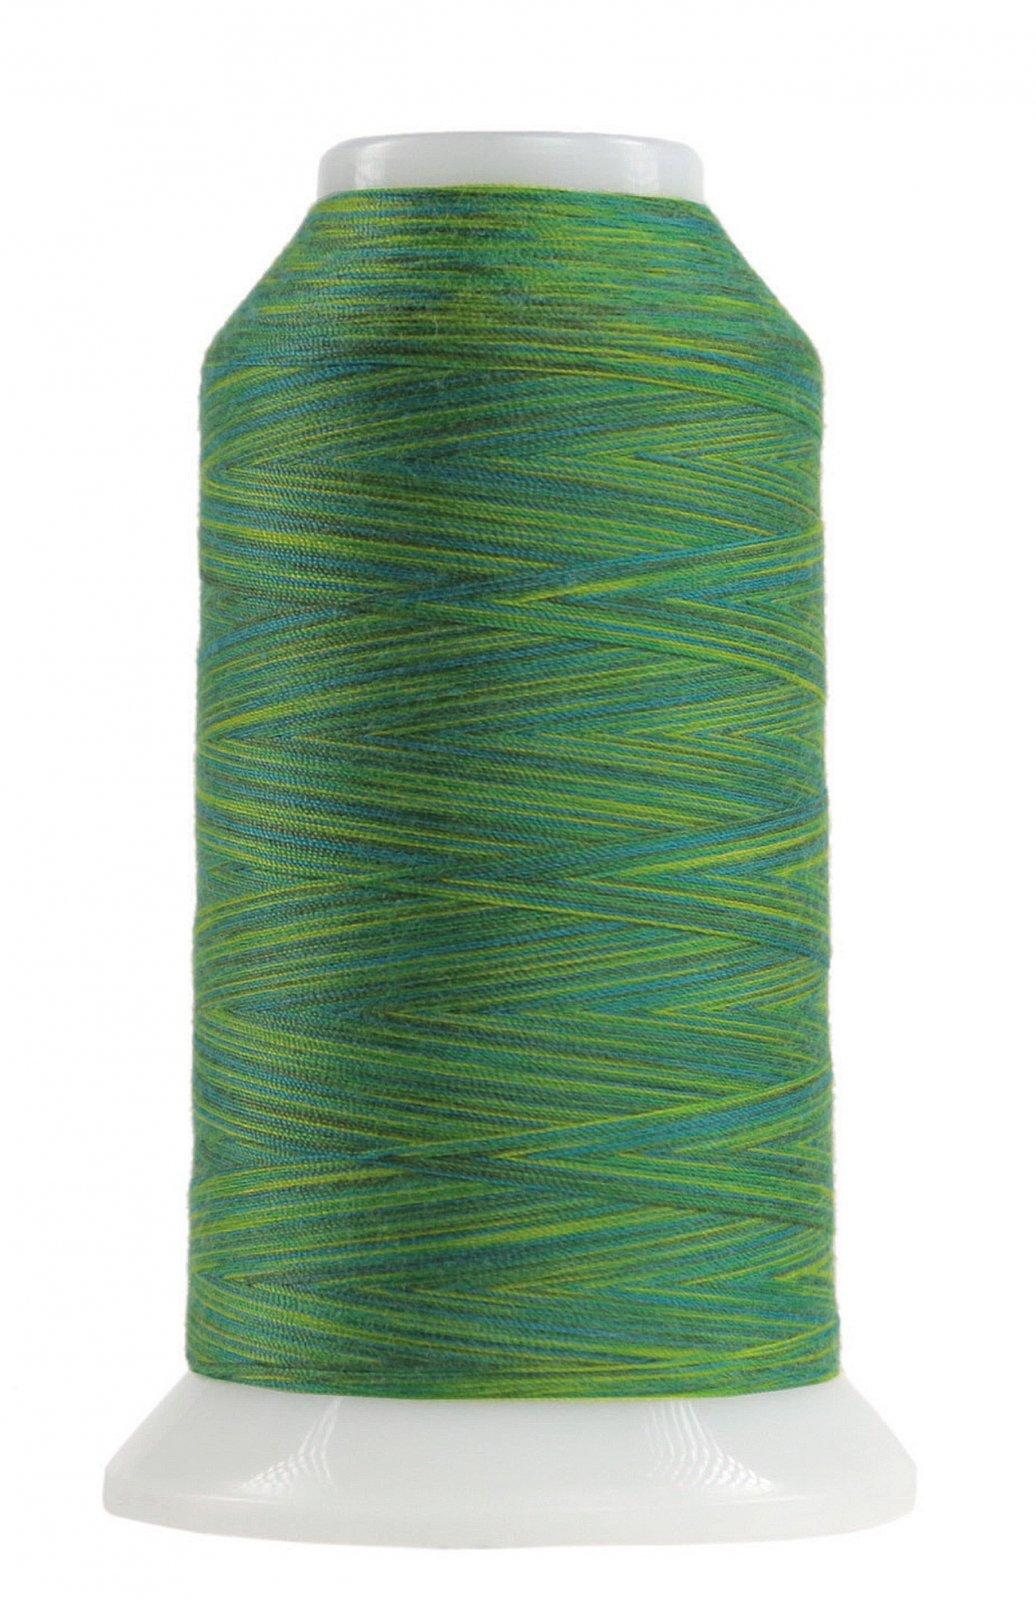 Omni Variegated Polyester Thread 40wt 2000yd Rolling Hills